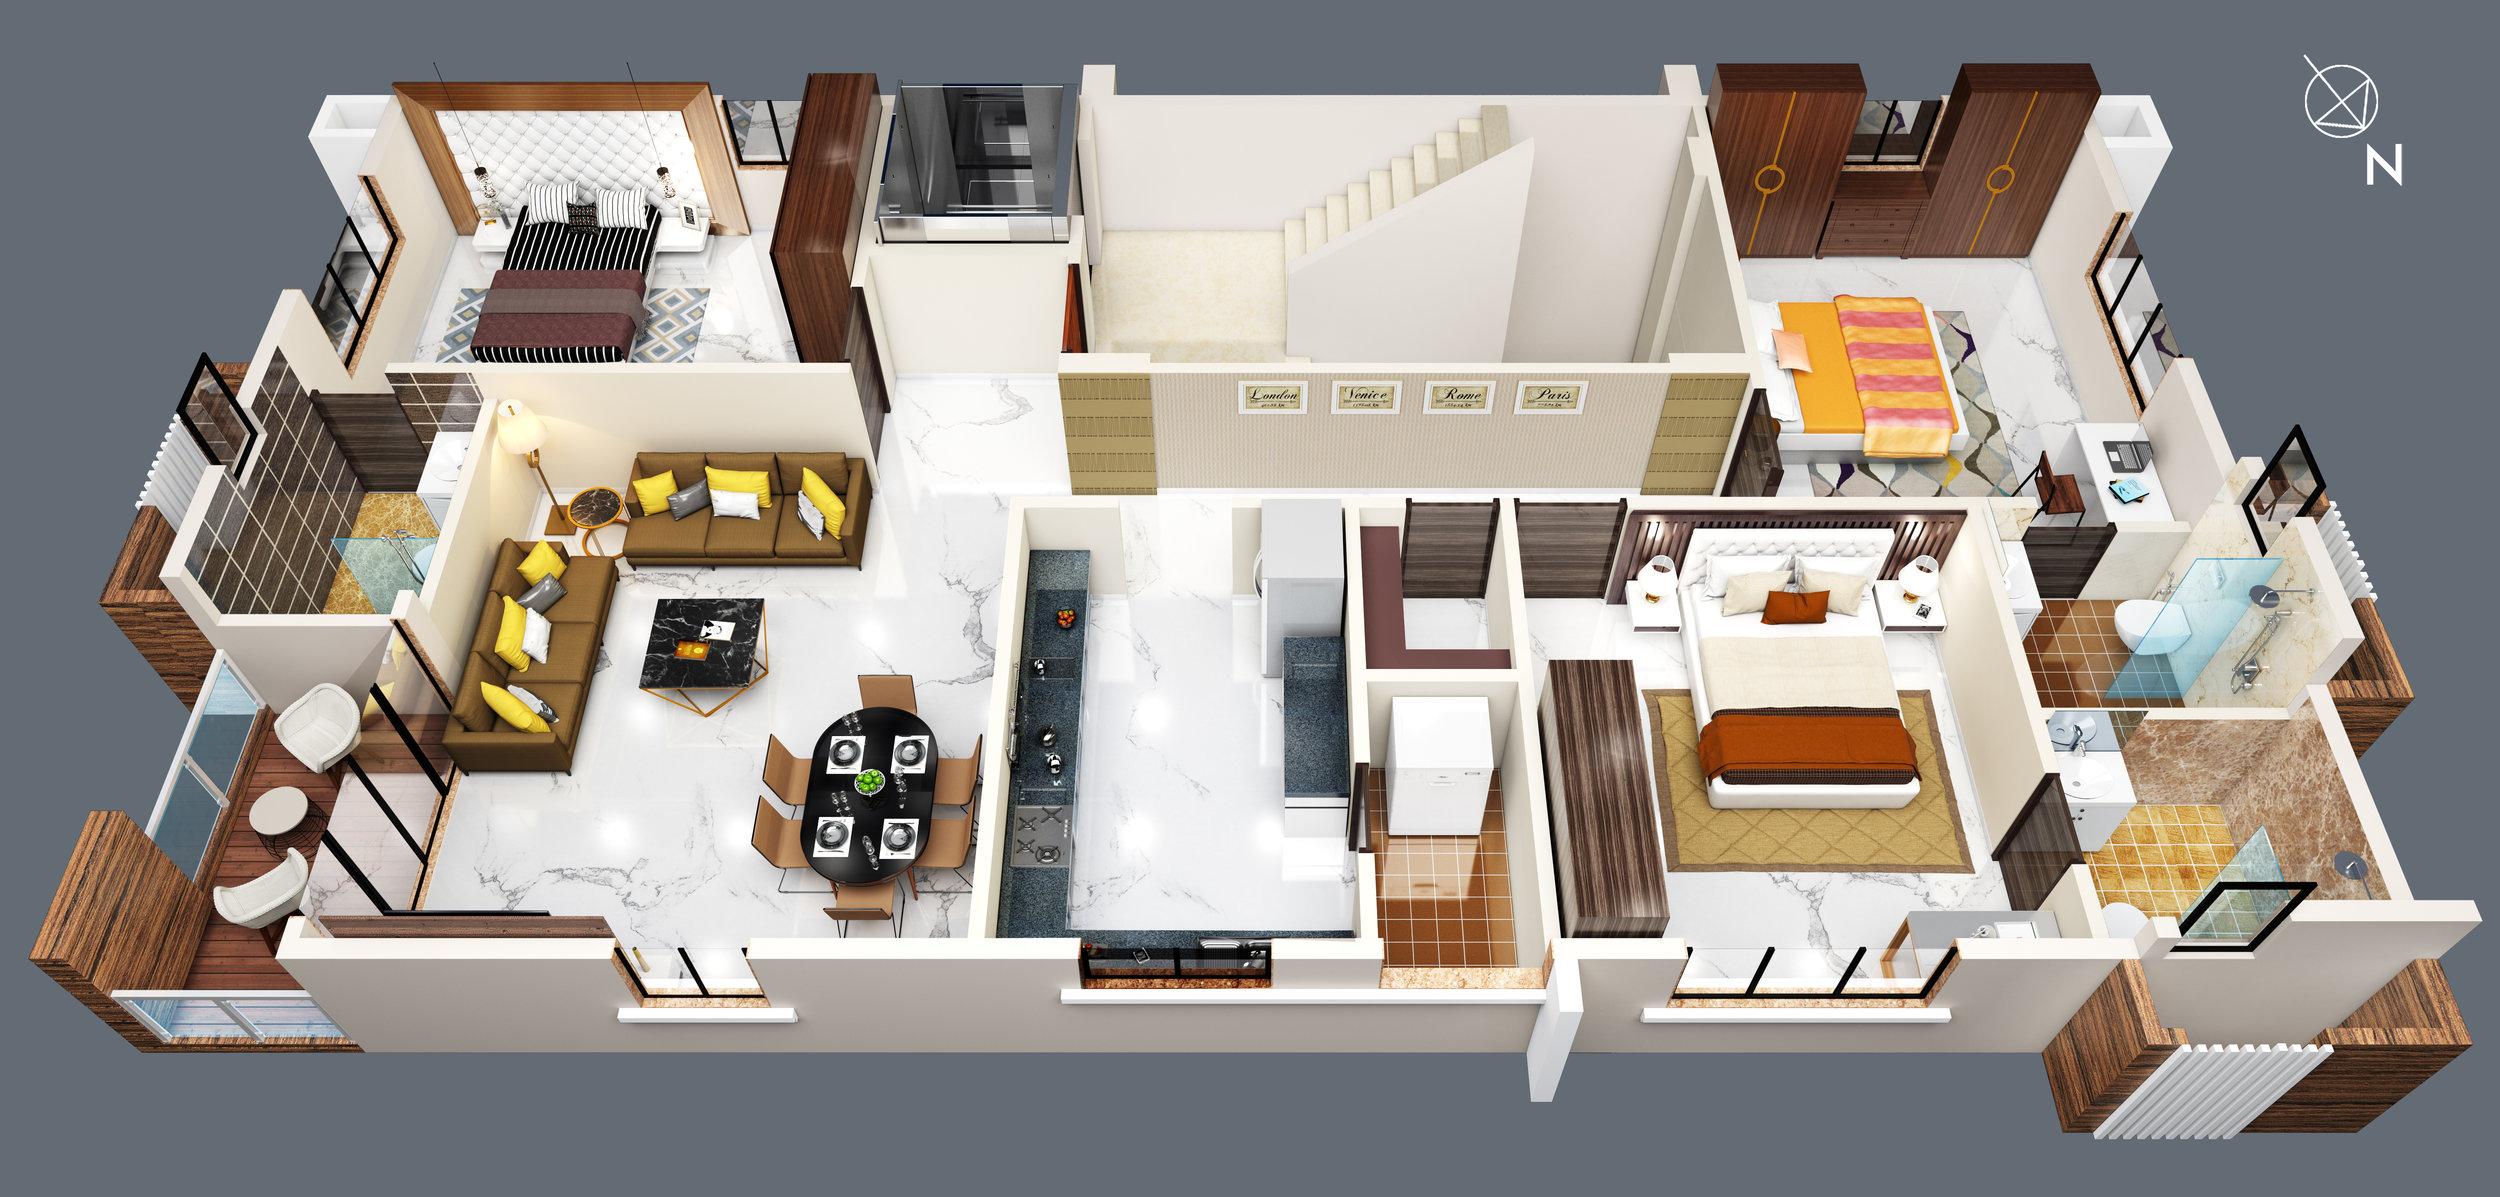 Isometric+Interior+View.jpeg